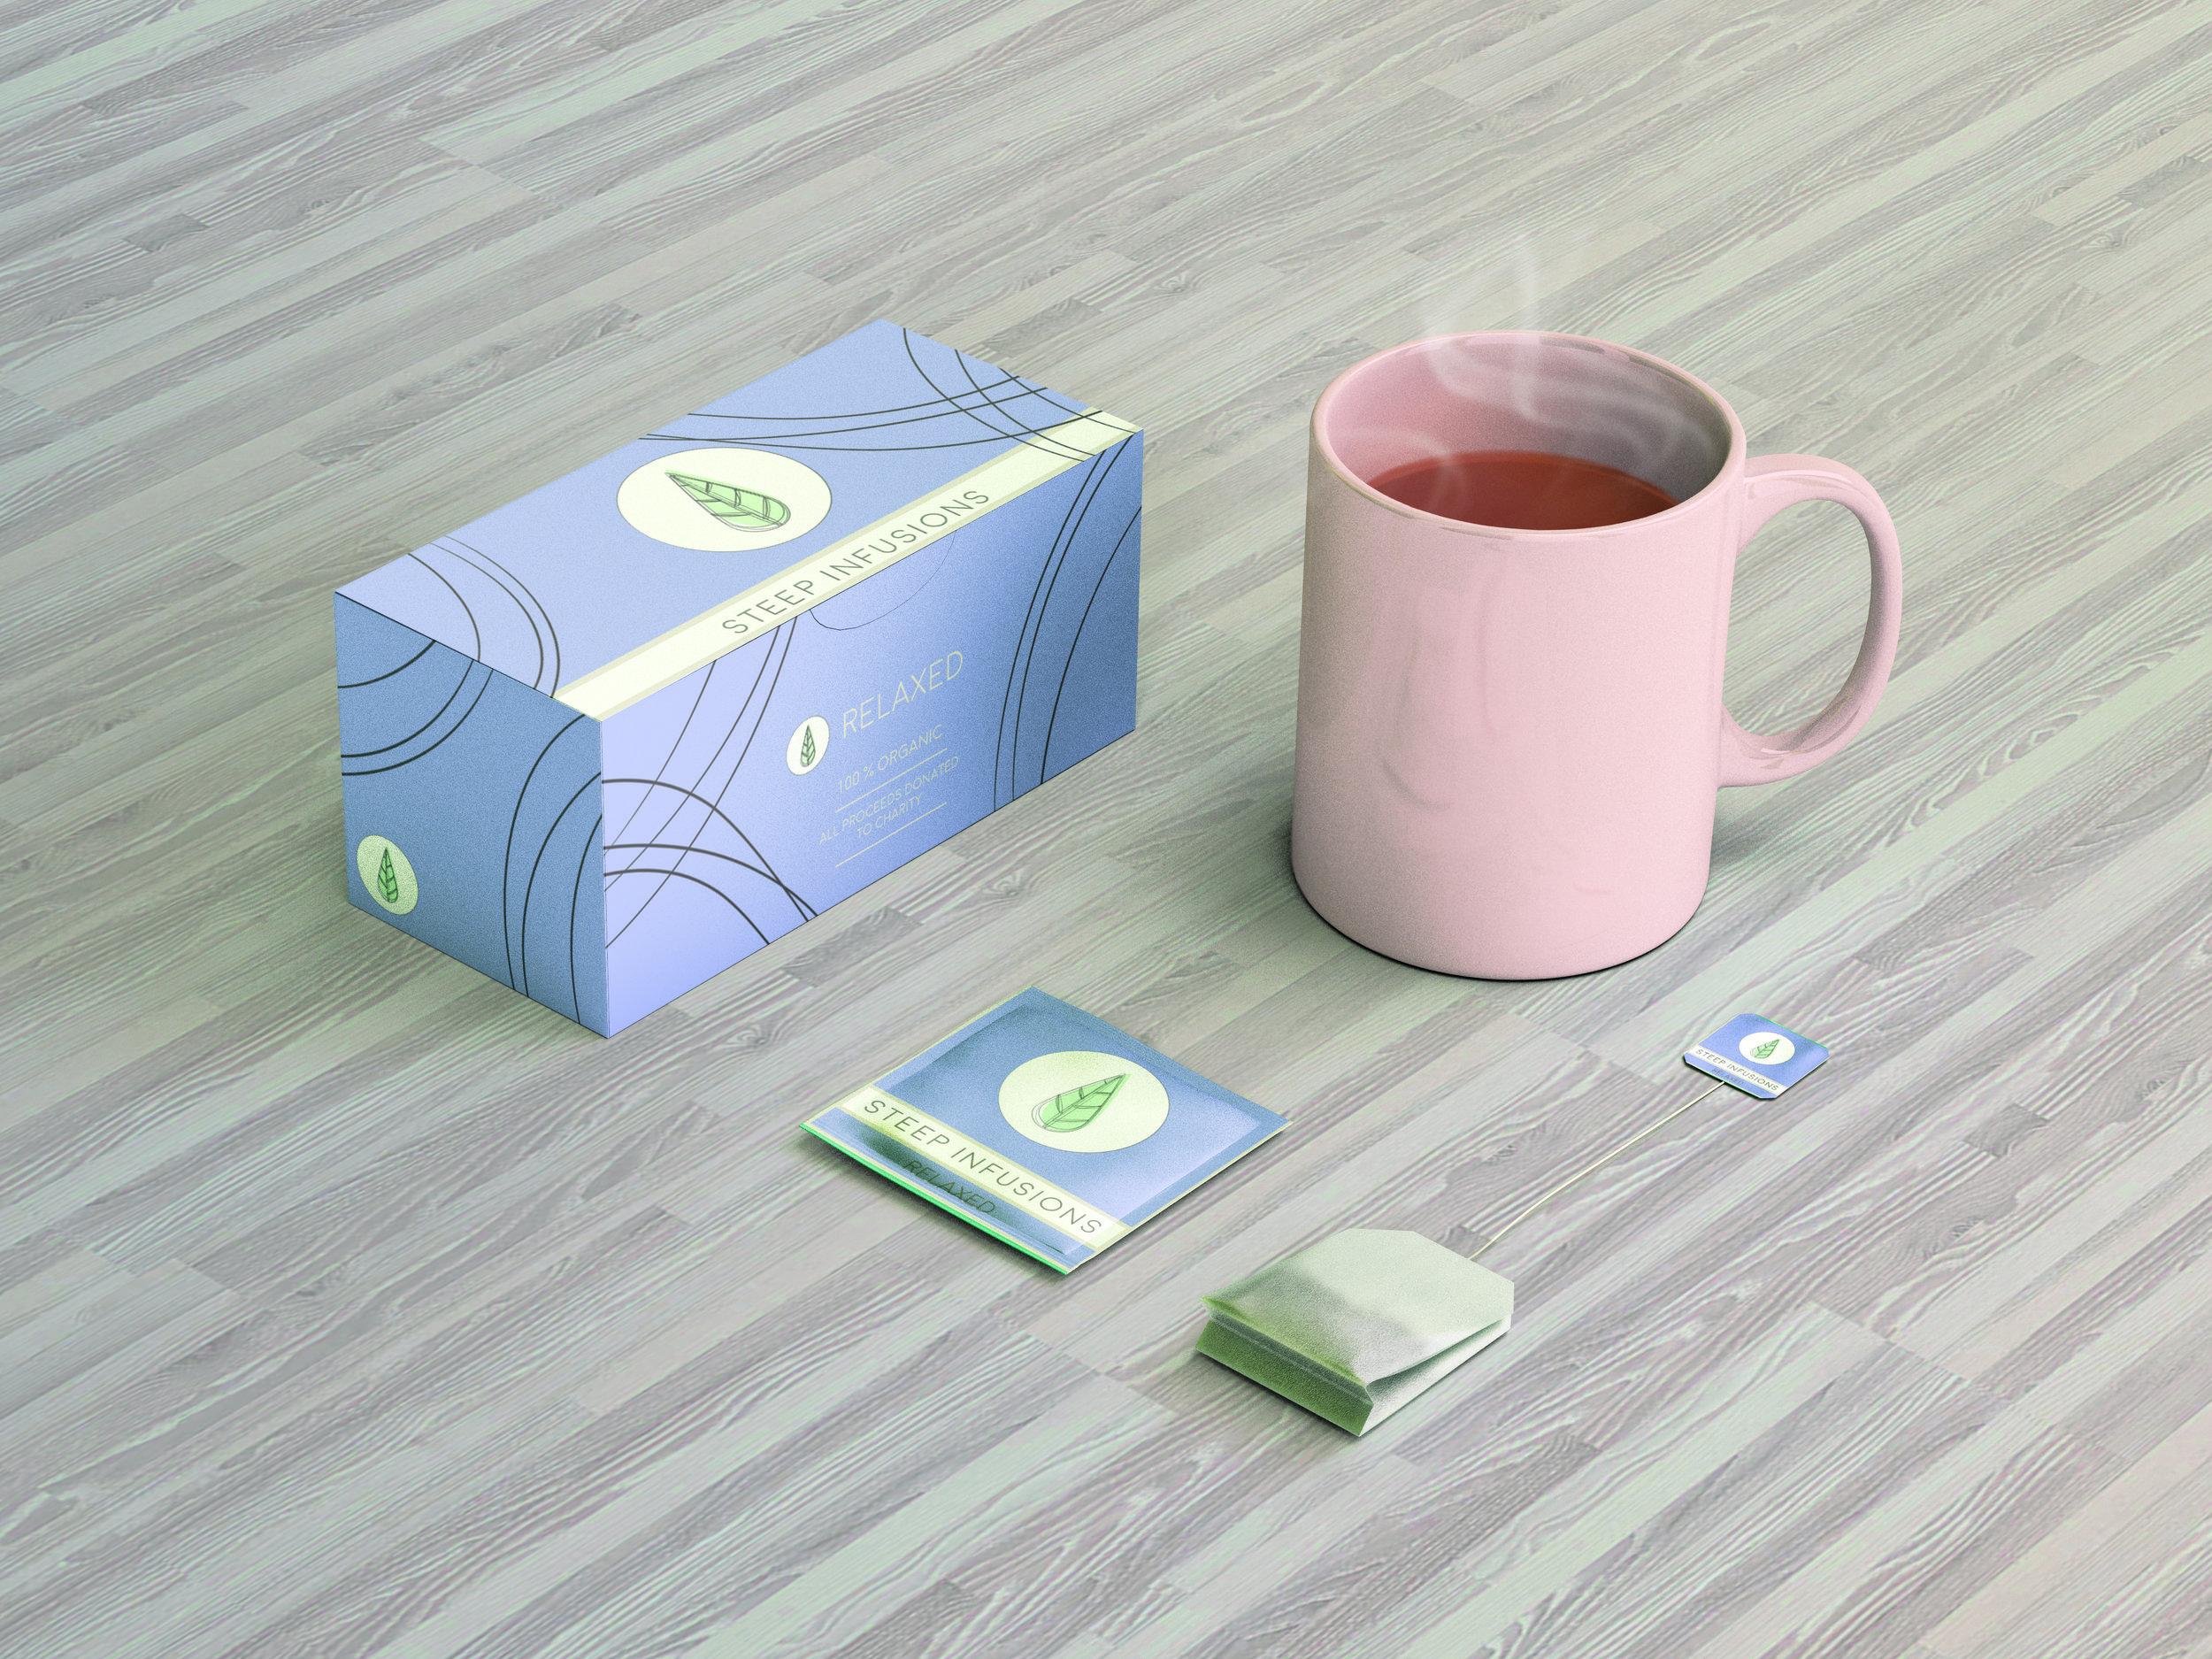 Branding Design and presentation for tea company.